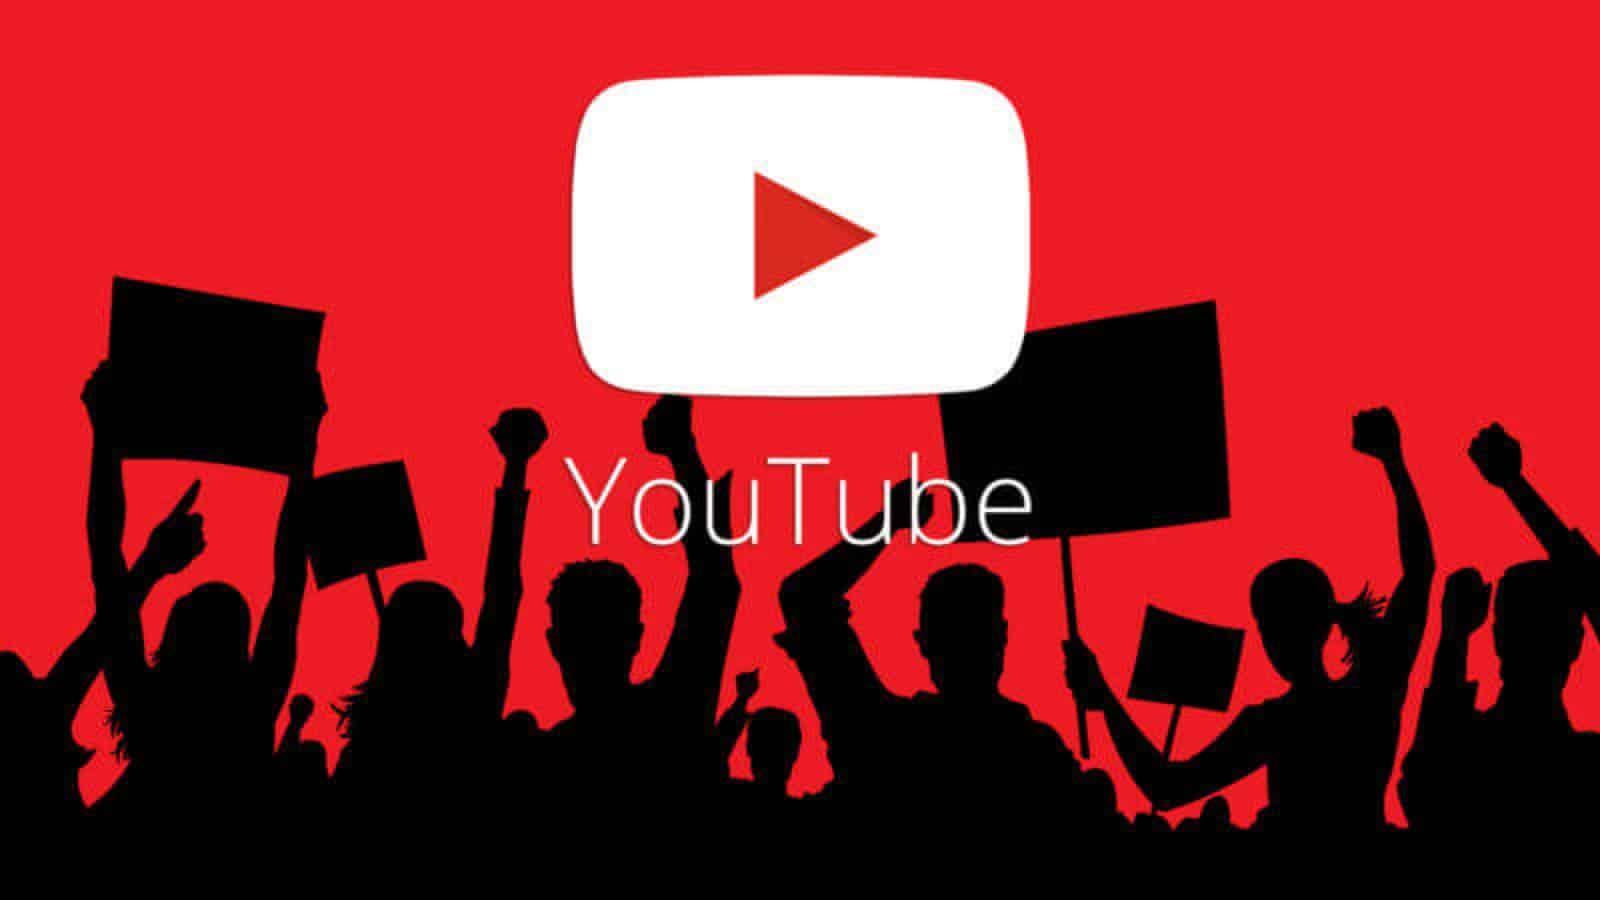 google play music youtube merge